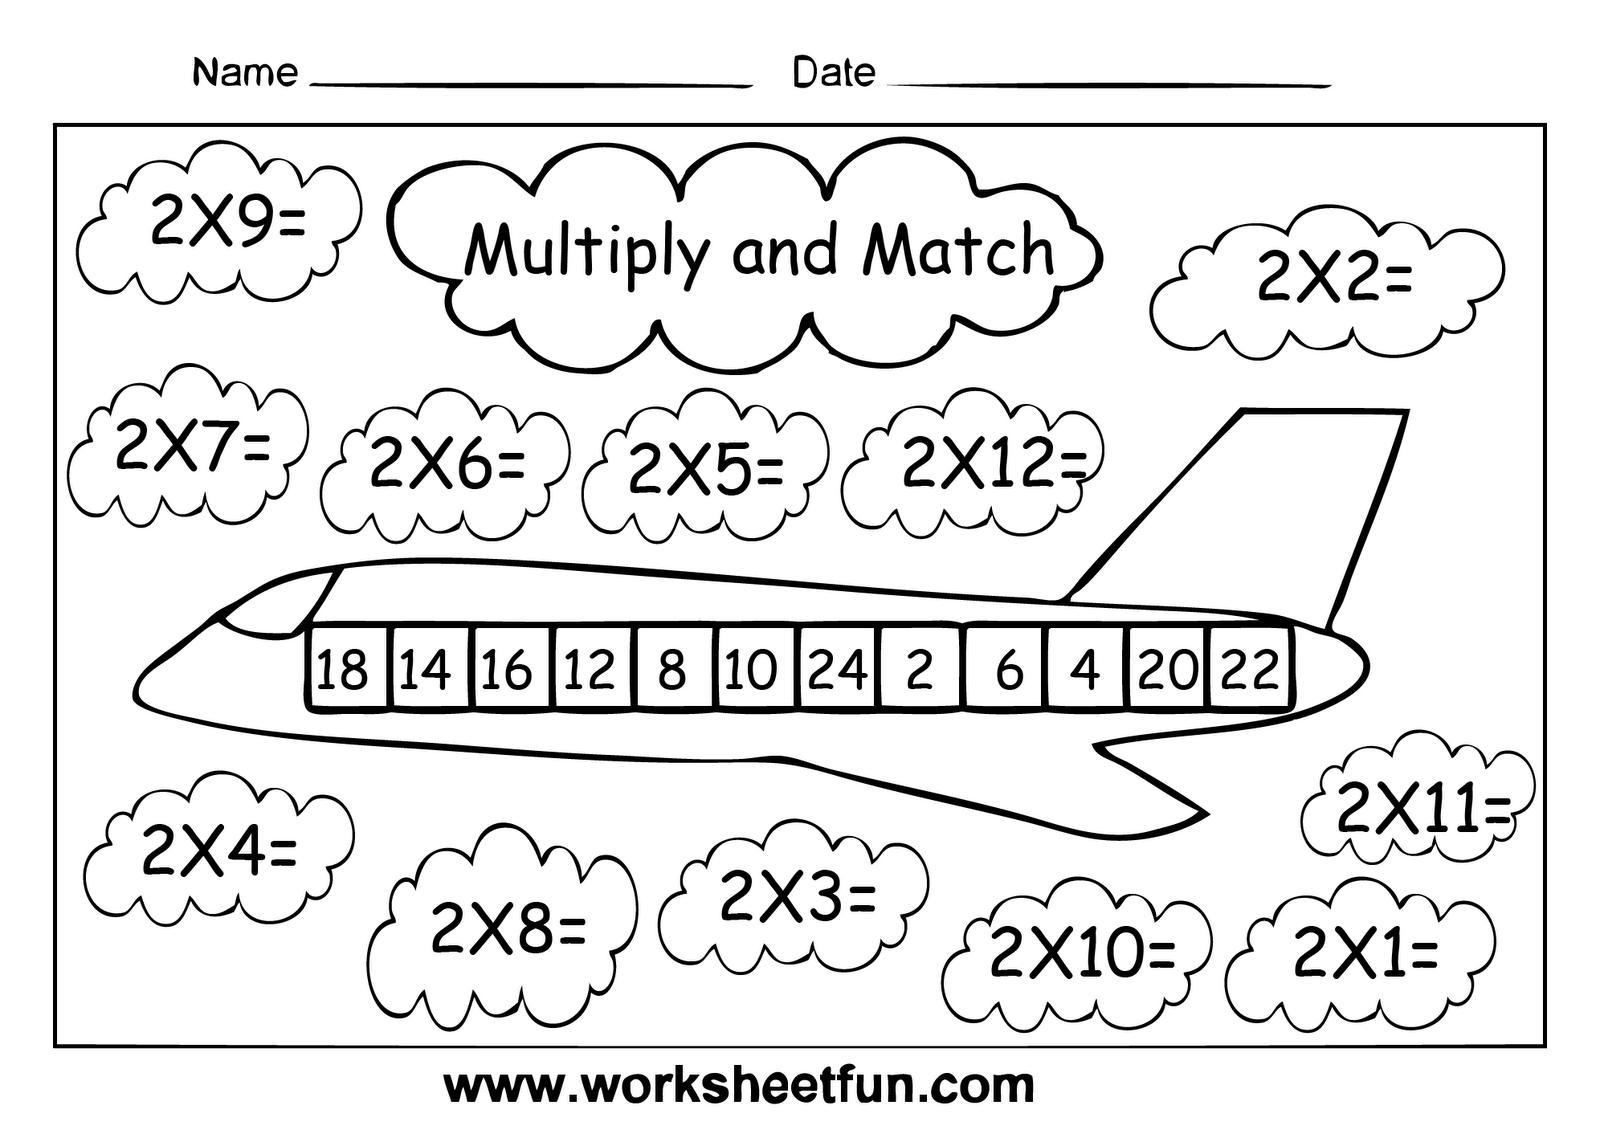 Multiplication Worksheets Grade 2 1